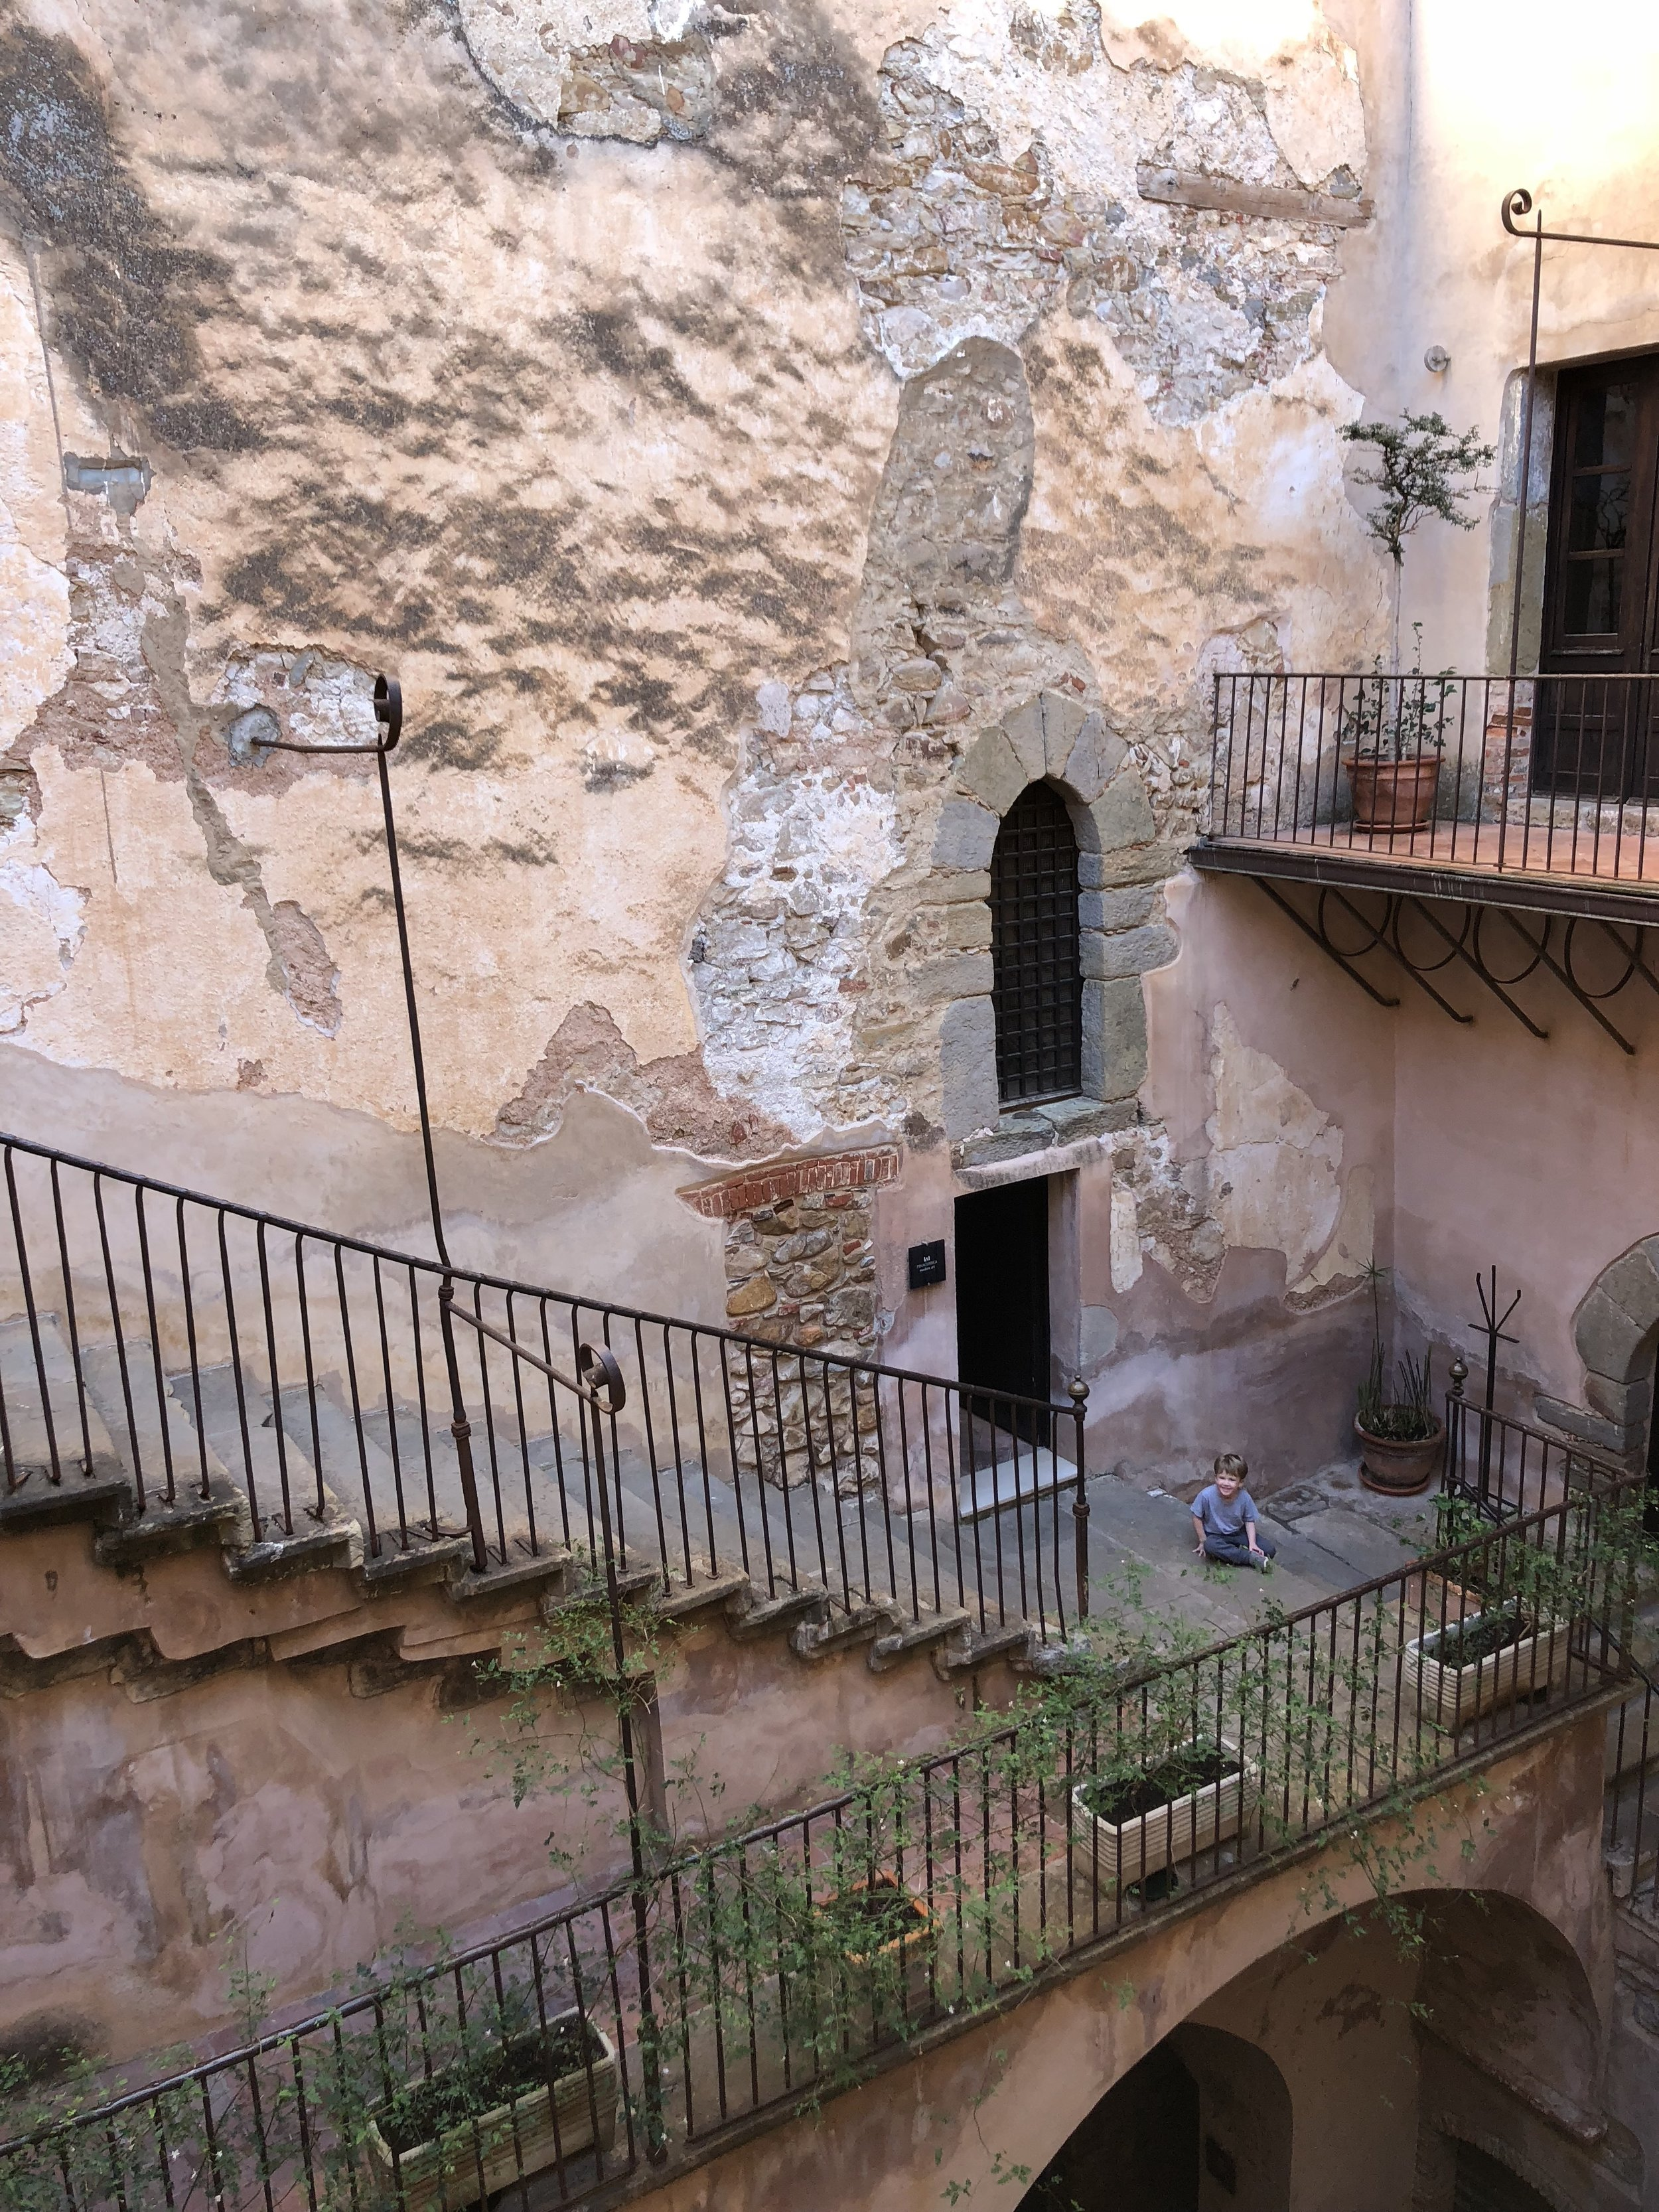 Exploring the castle in Castelbuono.